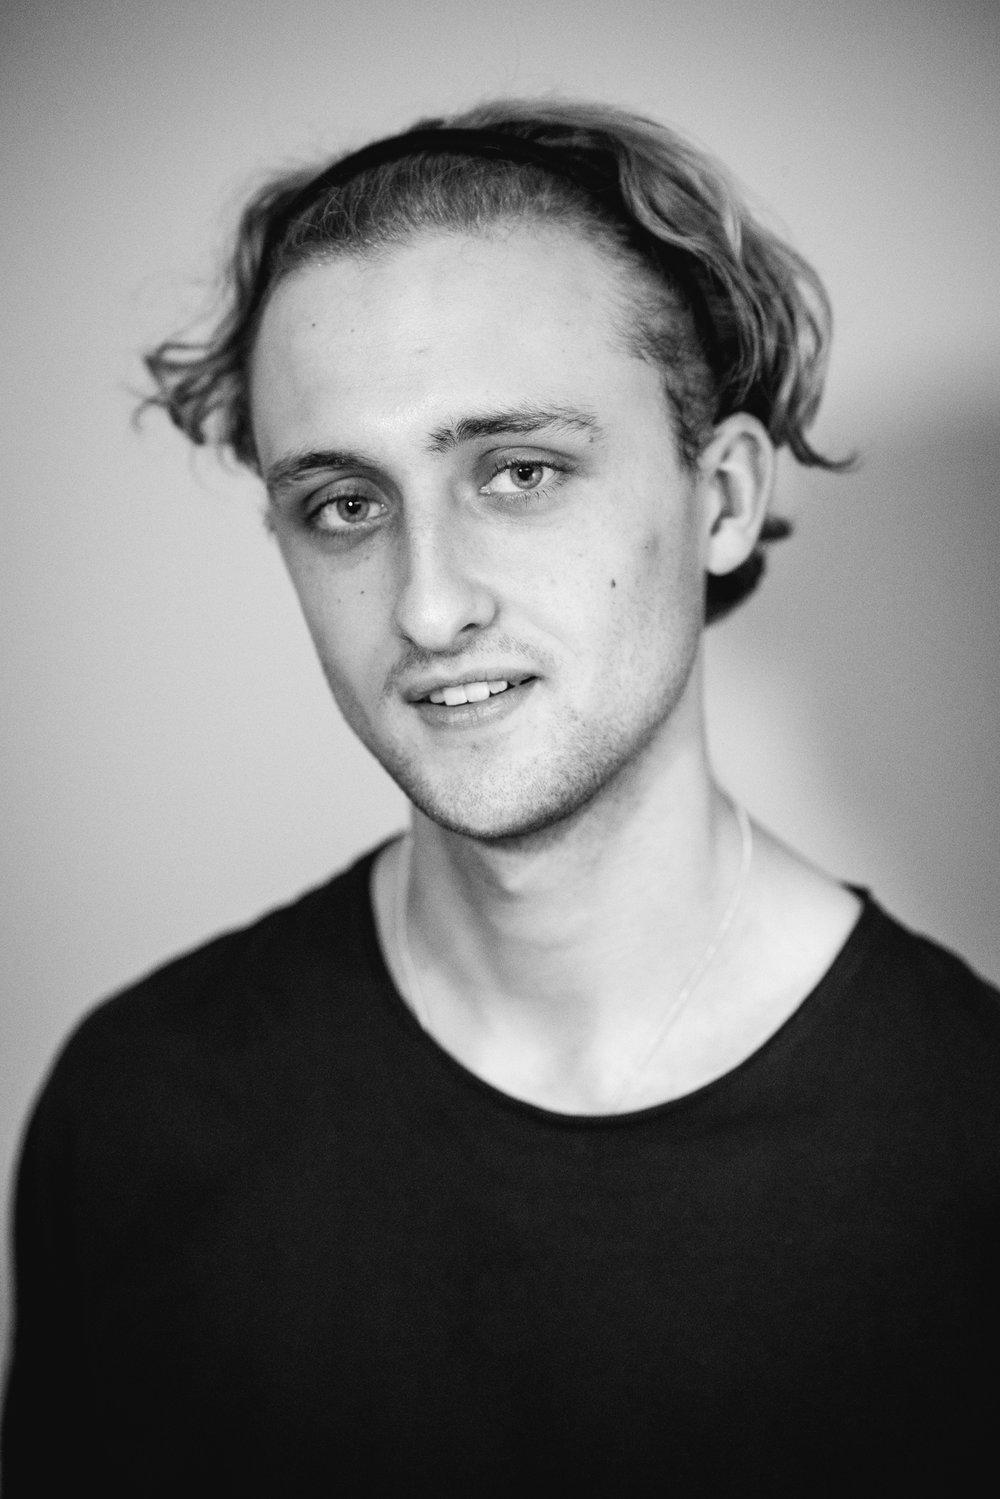 Alasdair Harriss, Creative Director